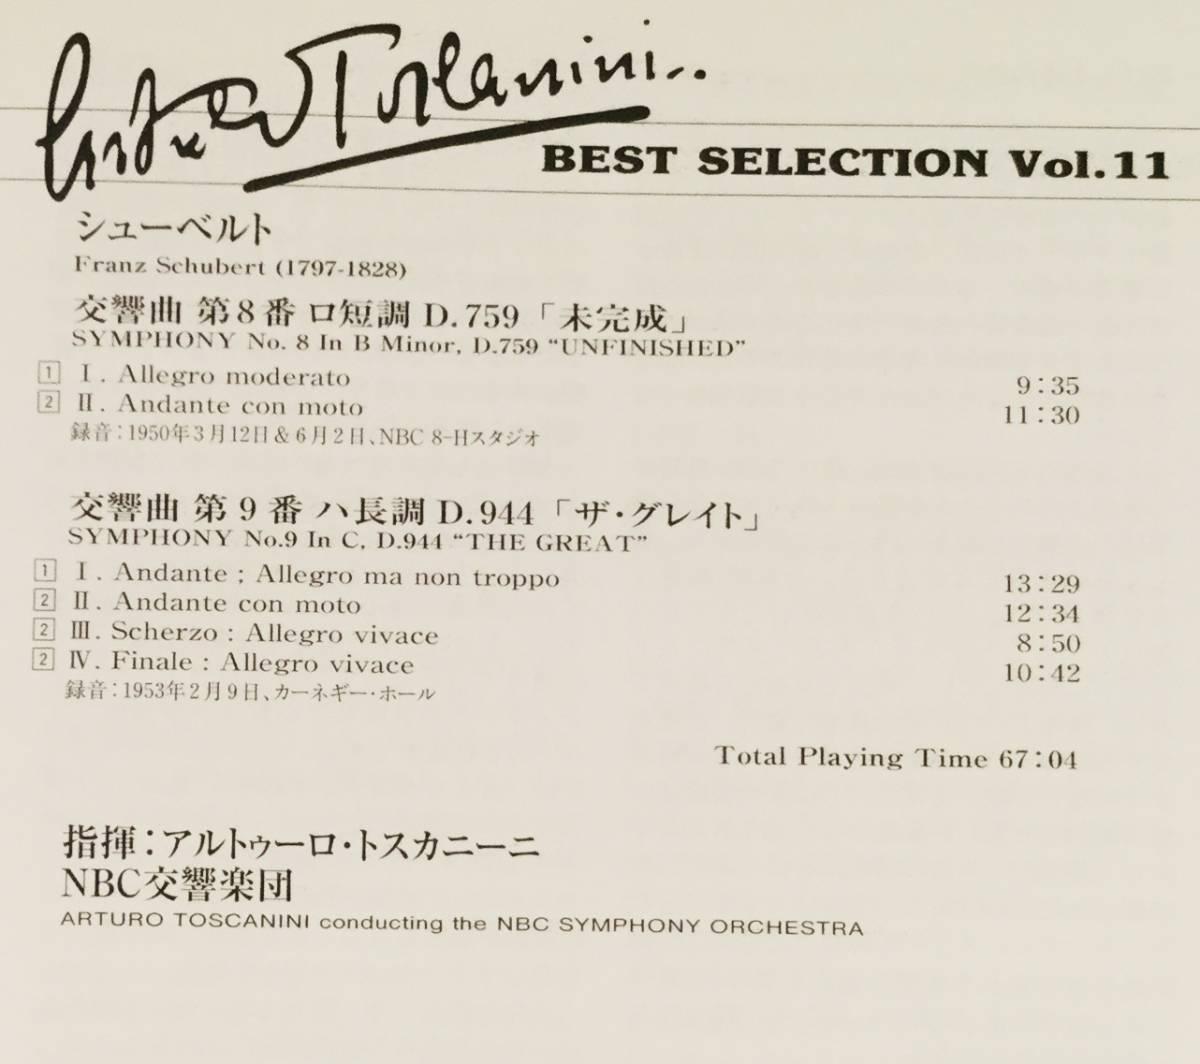 CD(完全限定盤)▲シューベルト:交響曲 第8番『未完成』&第9番『ザ・グレイト』◎アルトゥール・トスカニーニ指揮▲帯付美品!_画像3